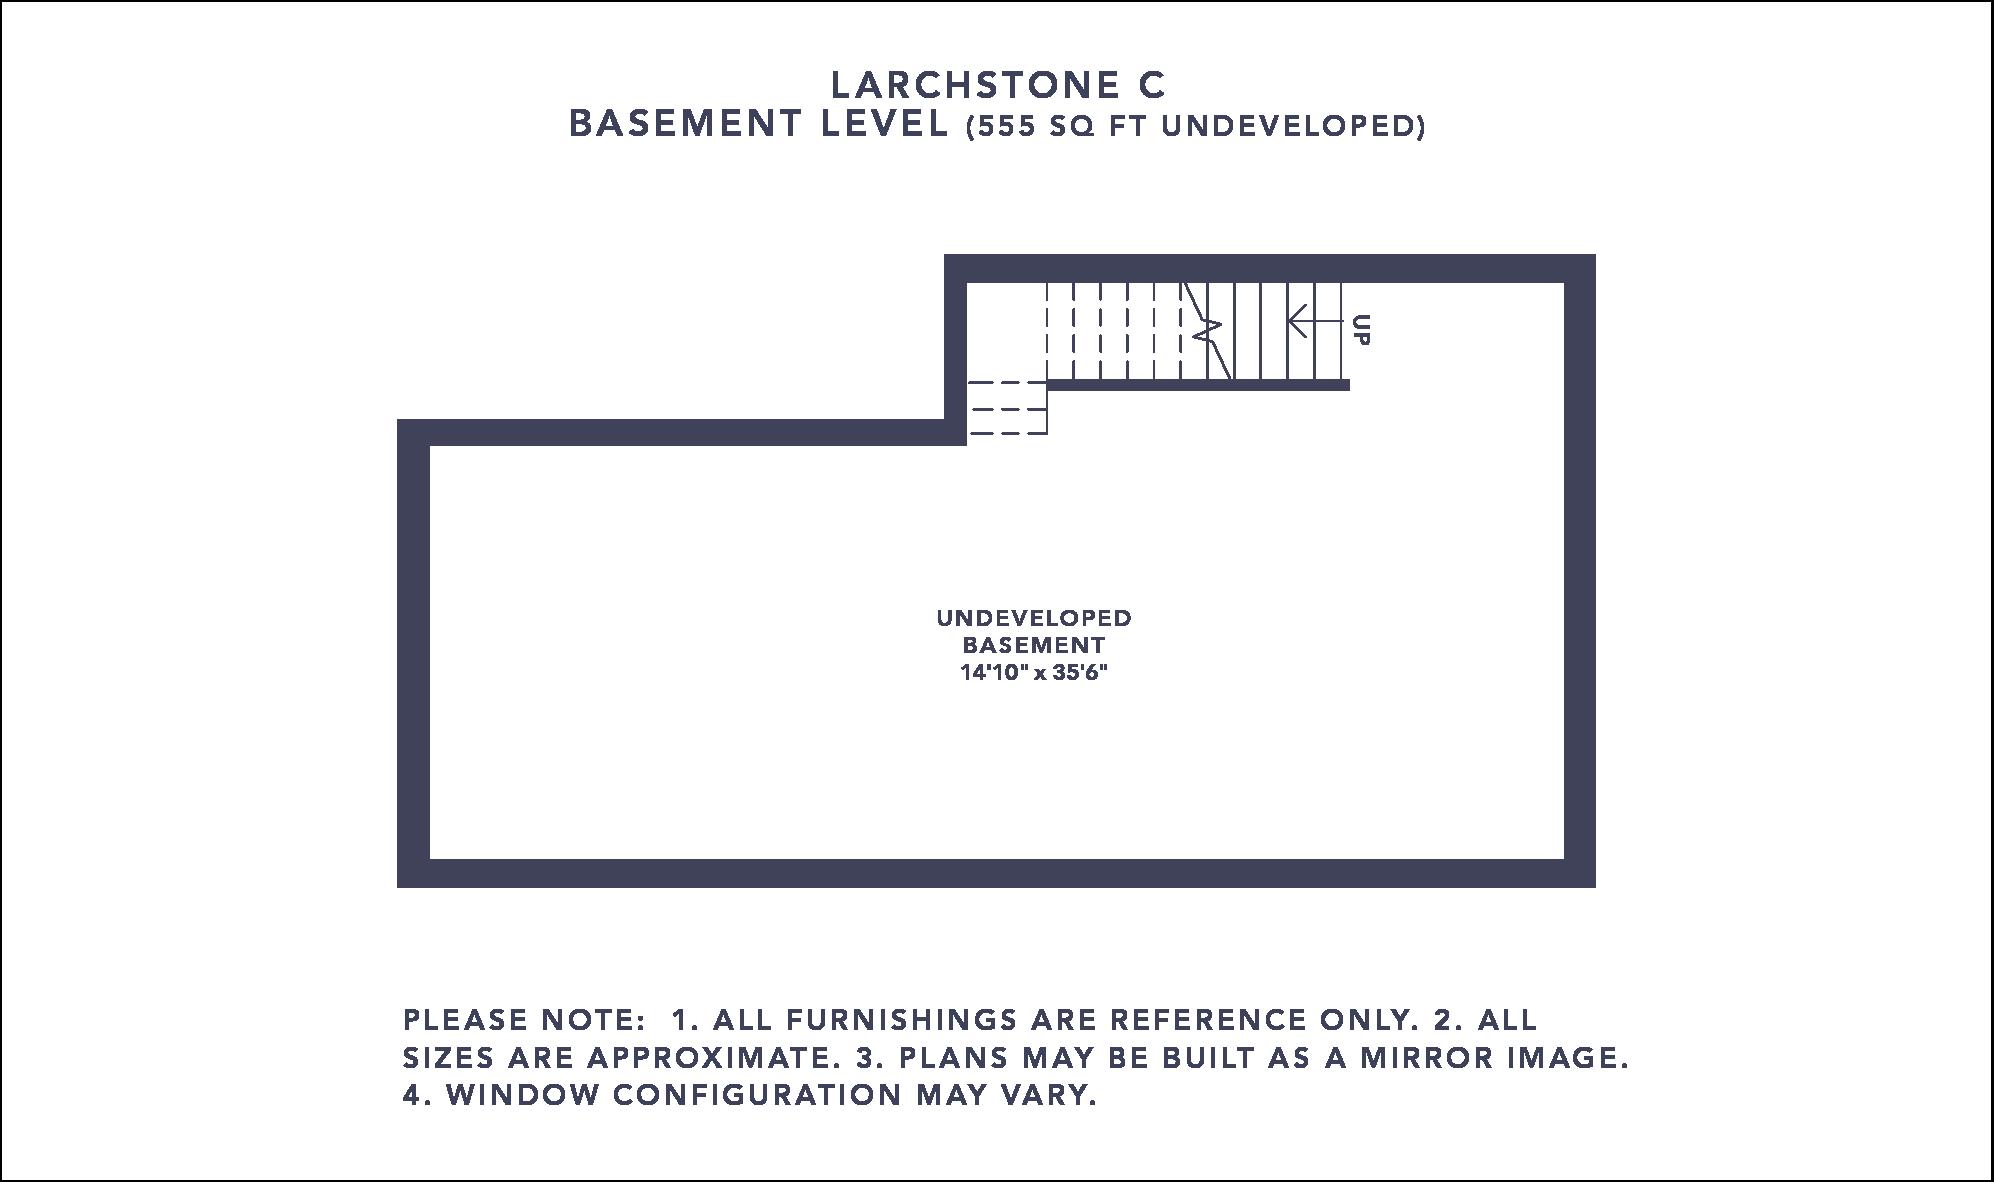 Larchstone C Floorplan - Basement Level